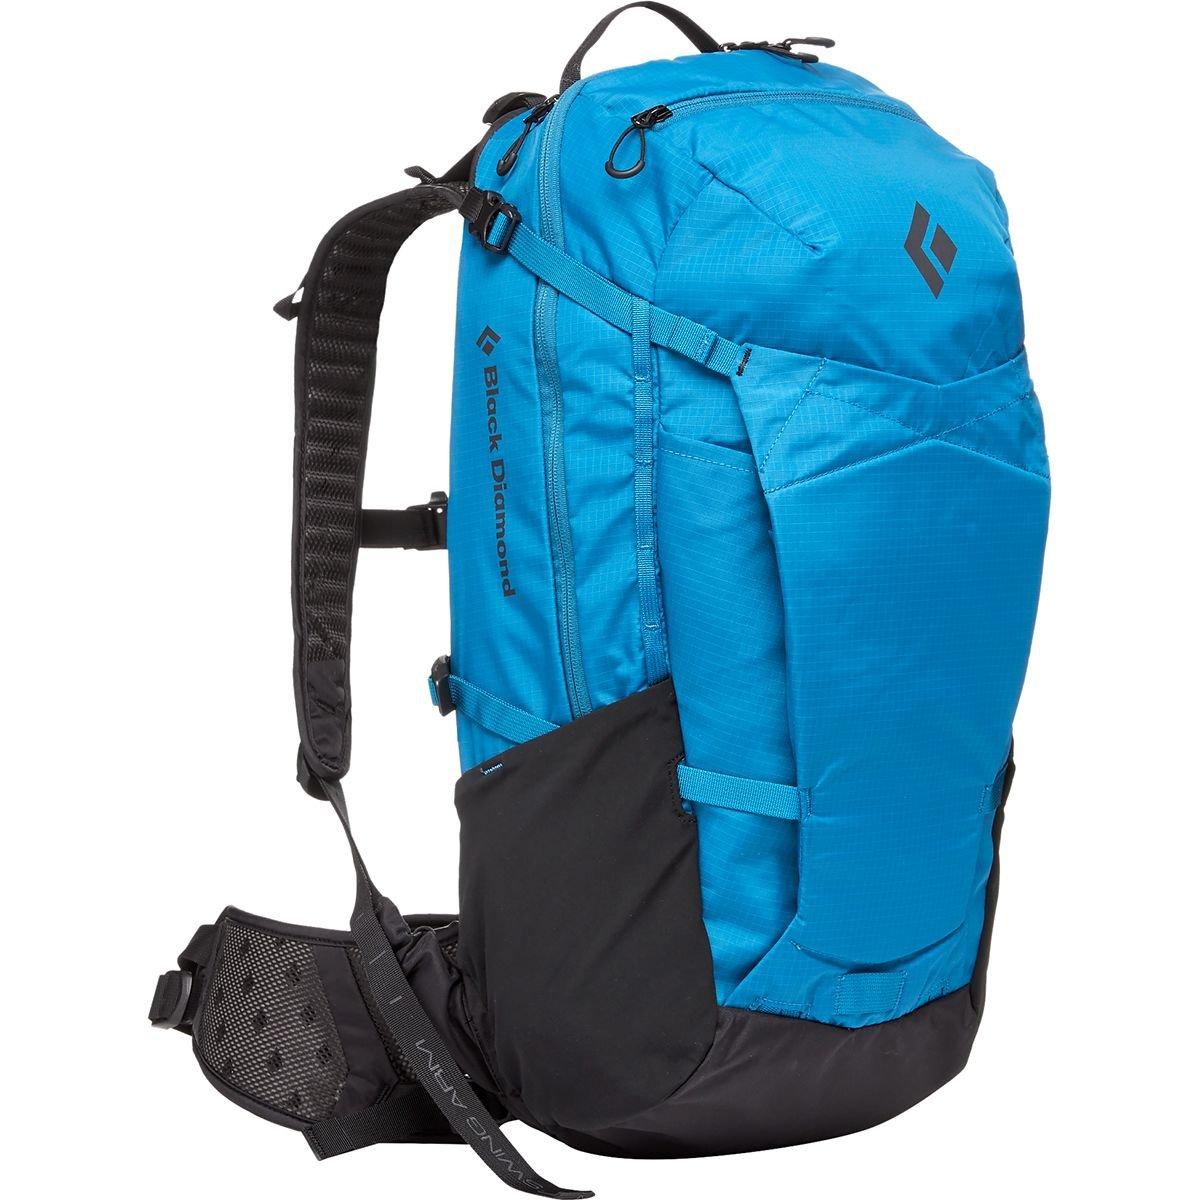 schwarz Diamond Nitro 26 Backpack - Outdoorrucksack